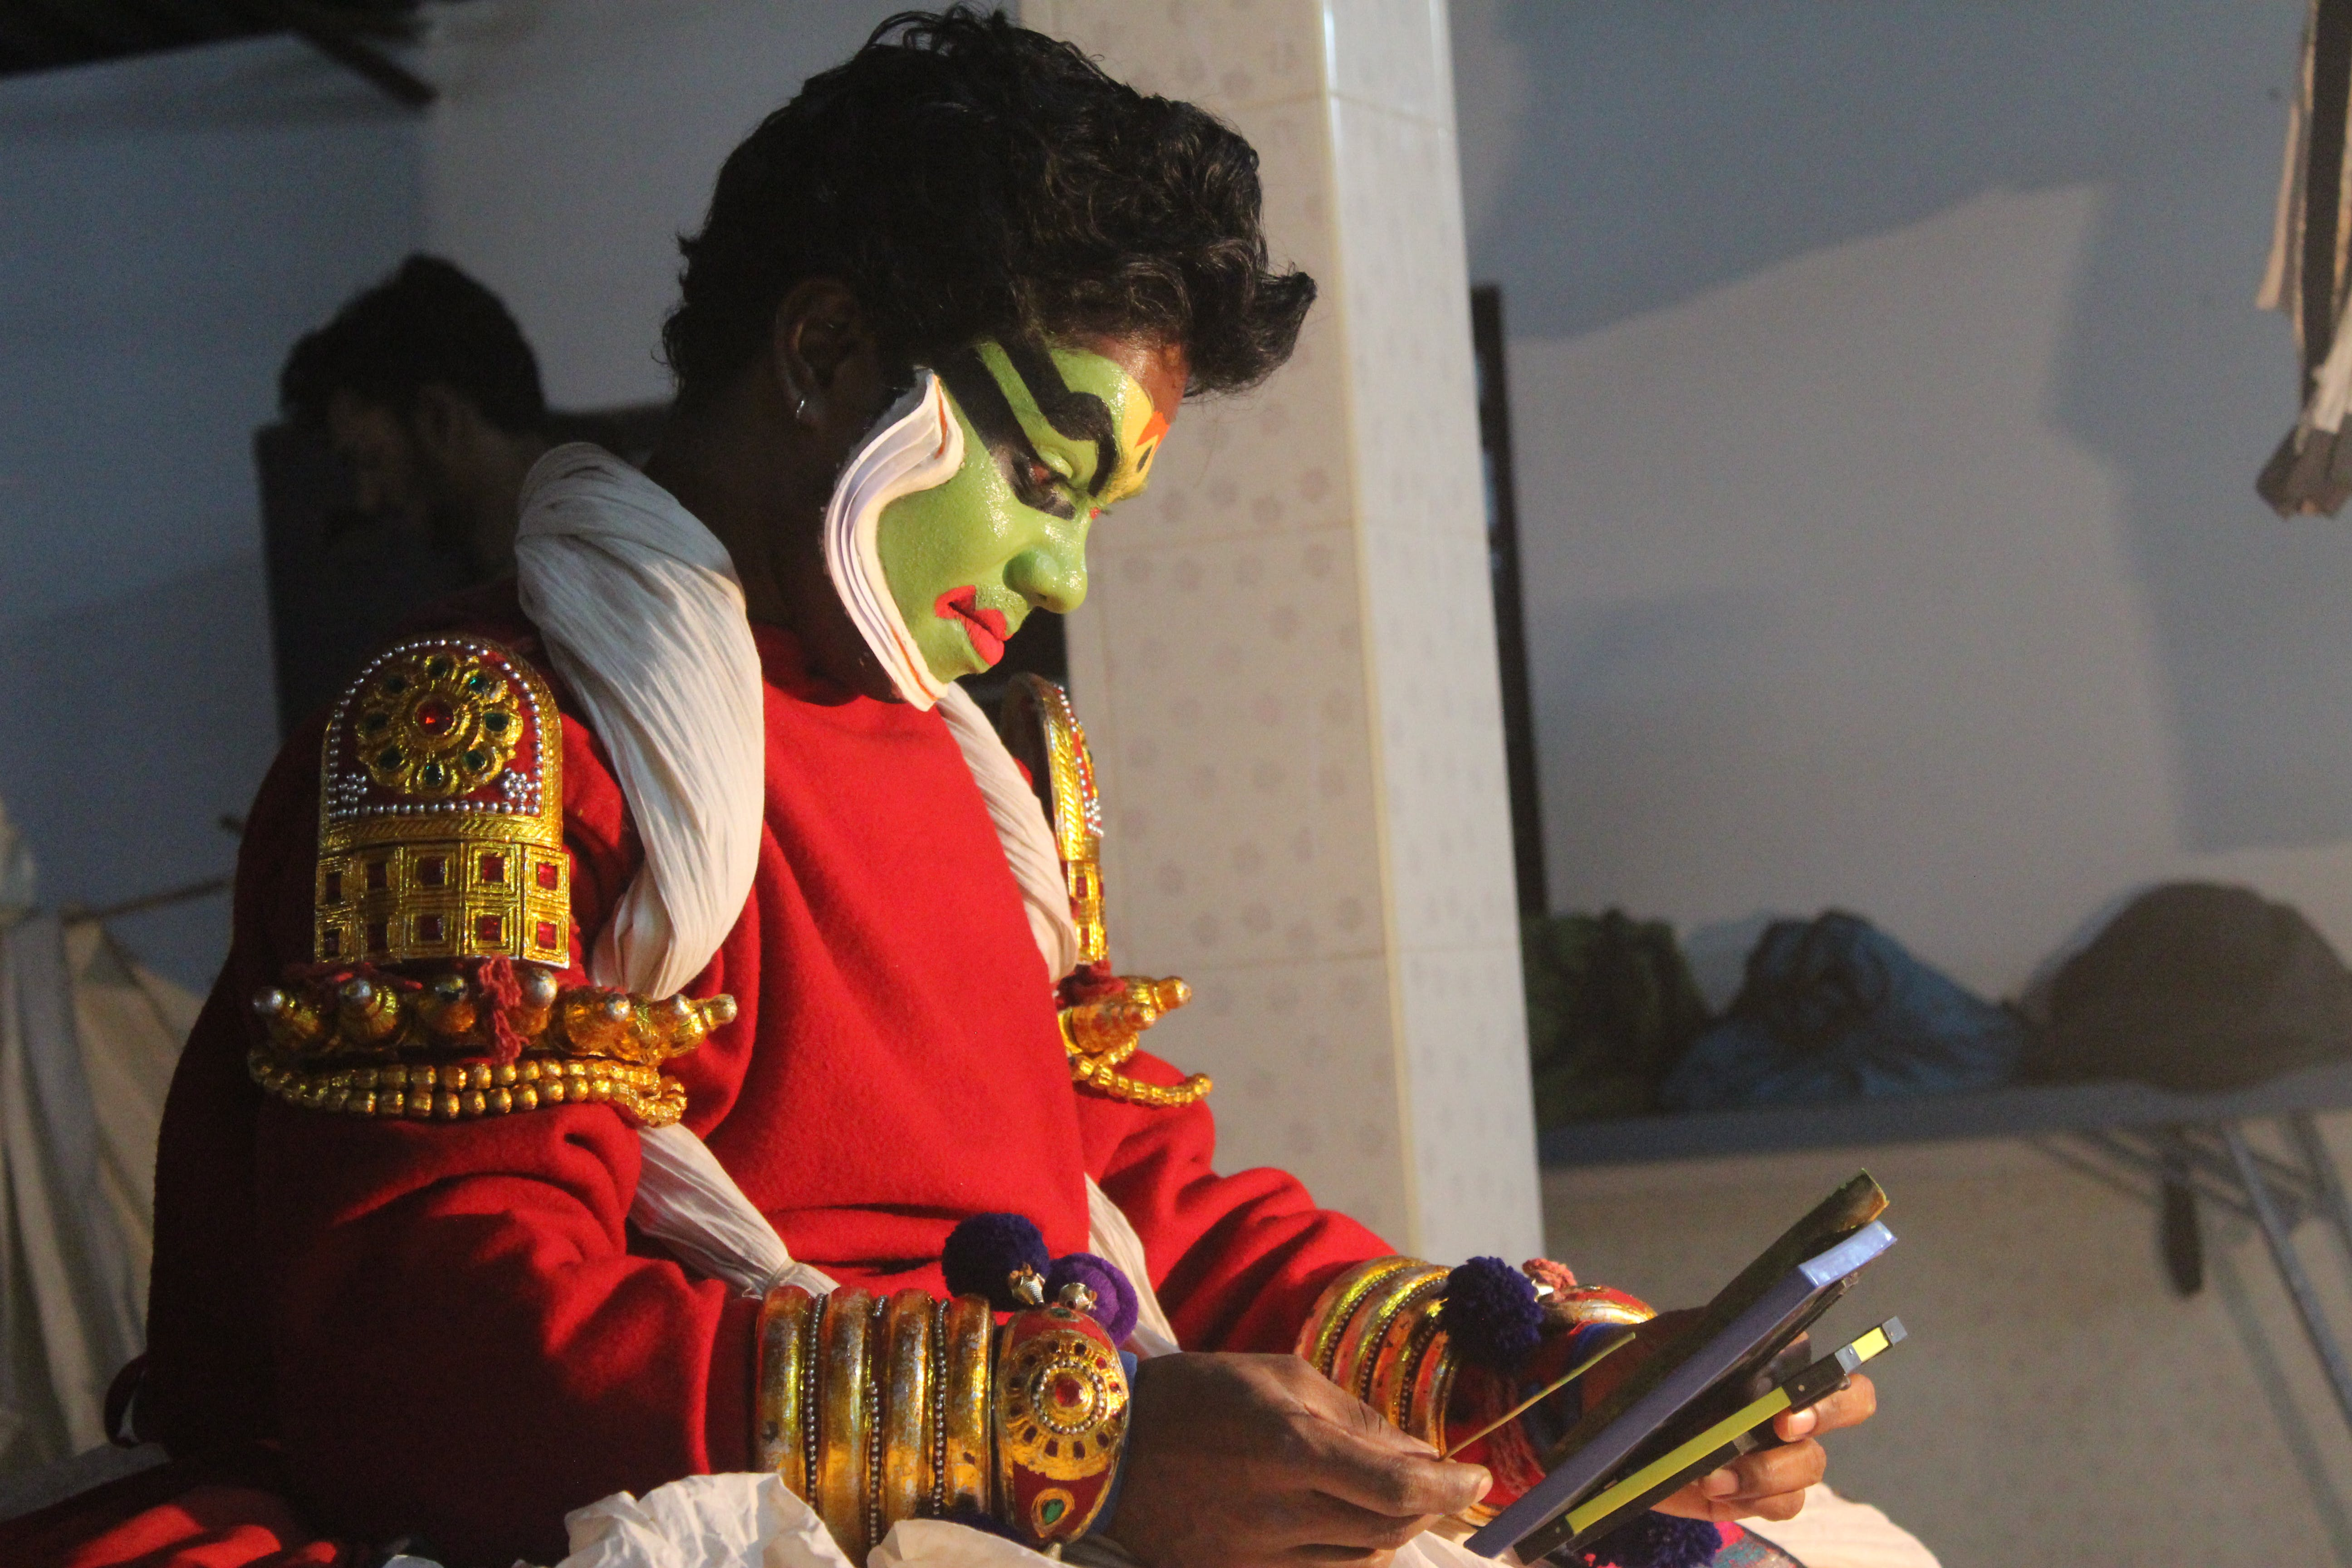 Kostenloses Stock Foto zu kathakali, kathakali schminke, kathakali tanzen, kathakali zieht sich an